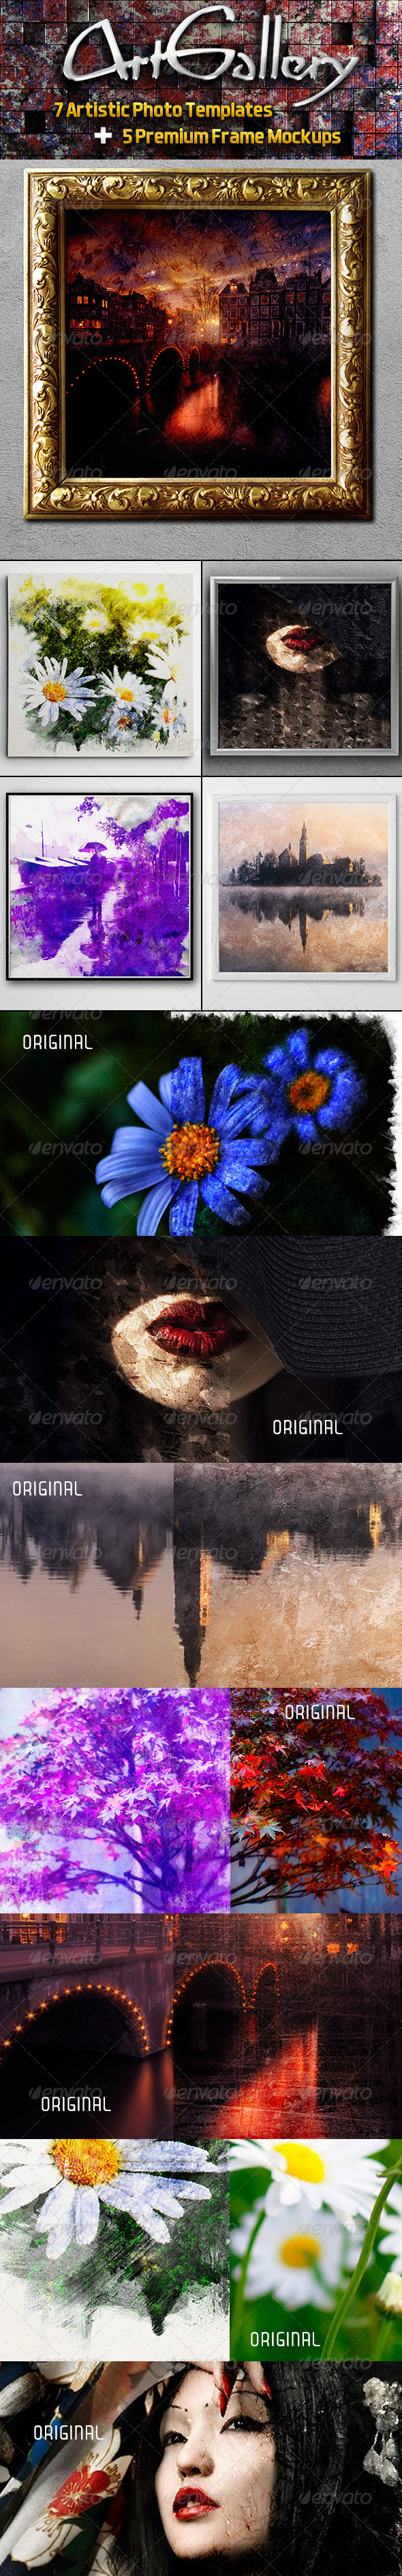 Art Gallery - Artistic Photo Templates